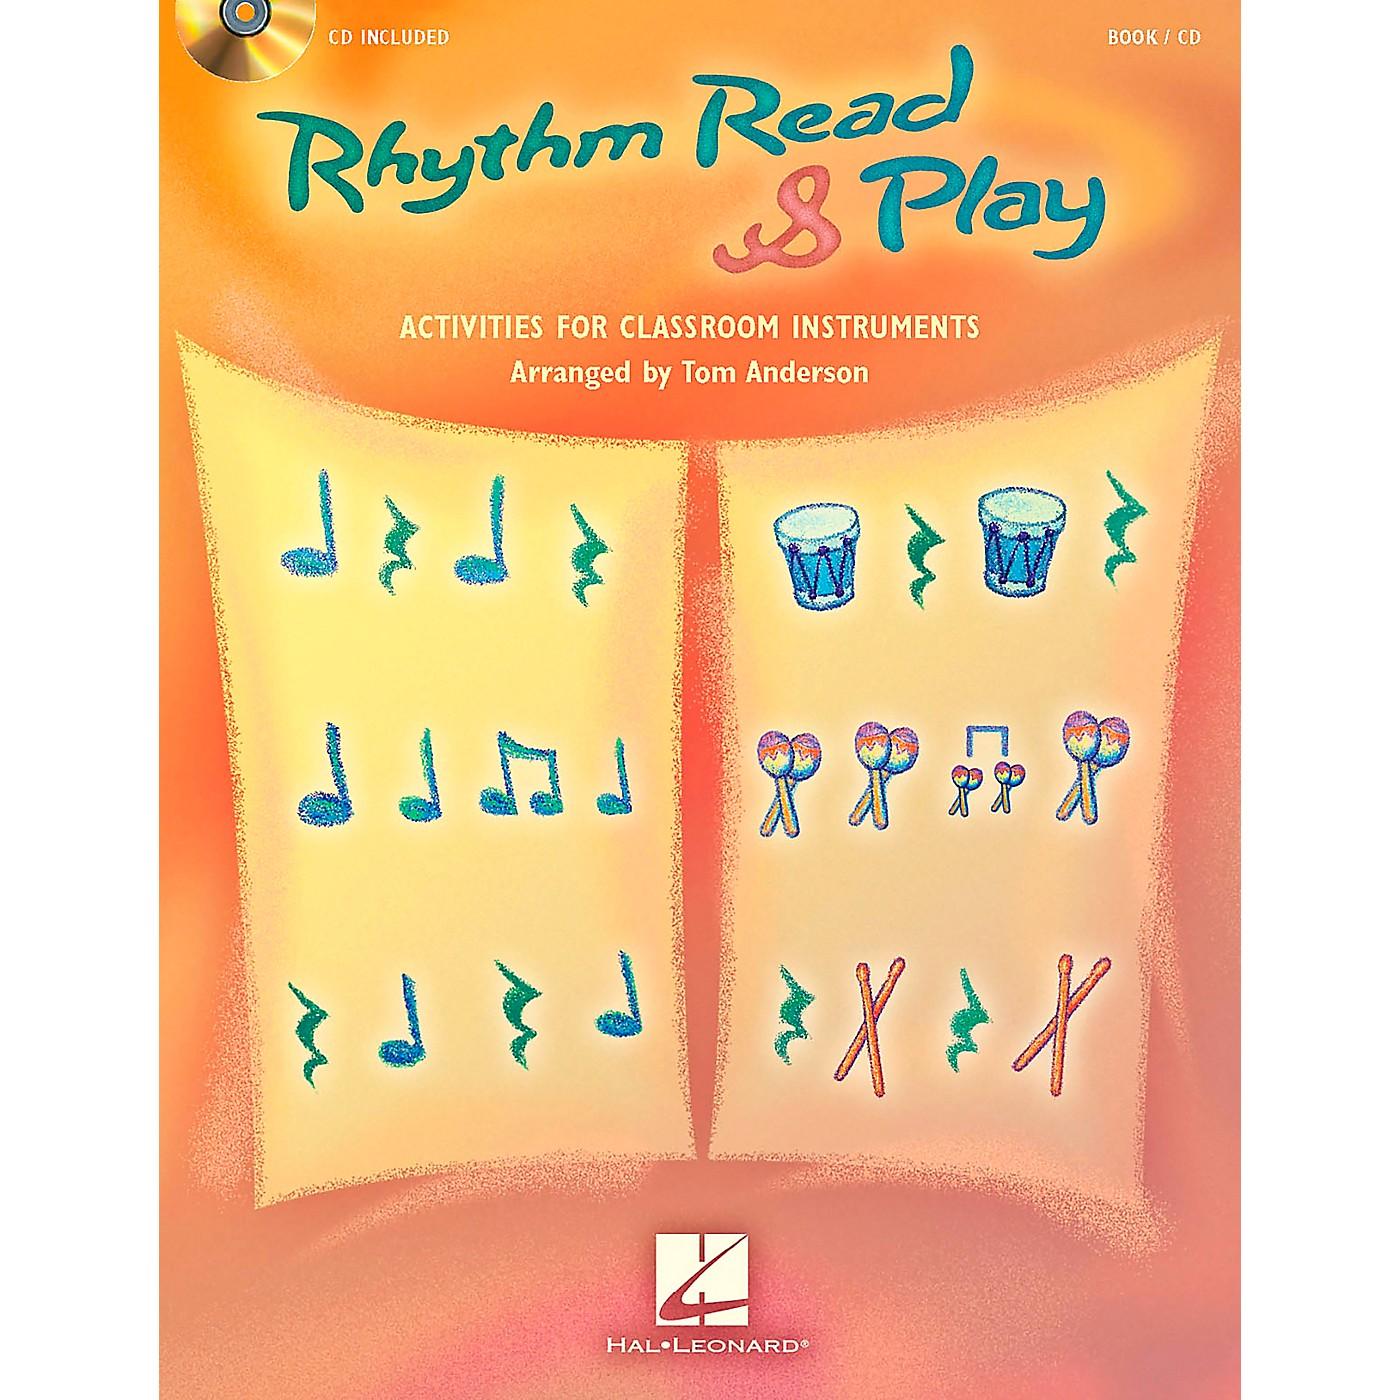 Hal Leonard Rhythm Read & Play - Activities for Classroom Instruments Book/CD thumbnail